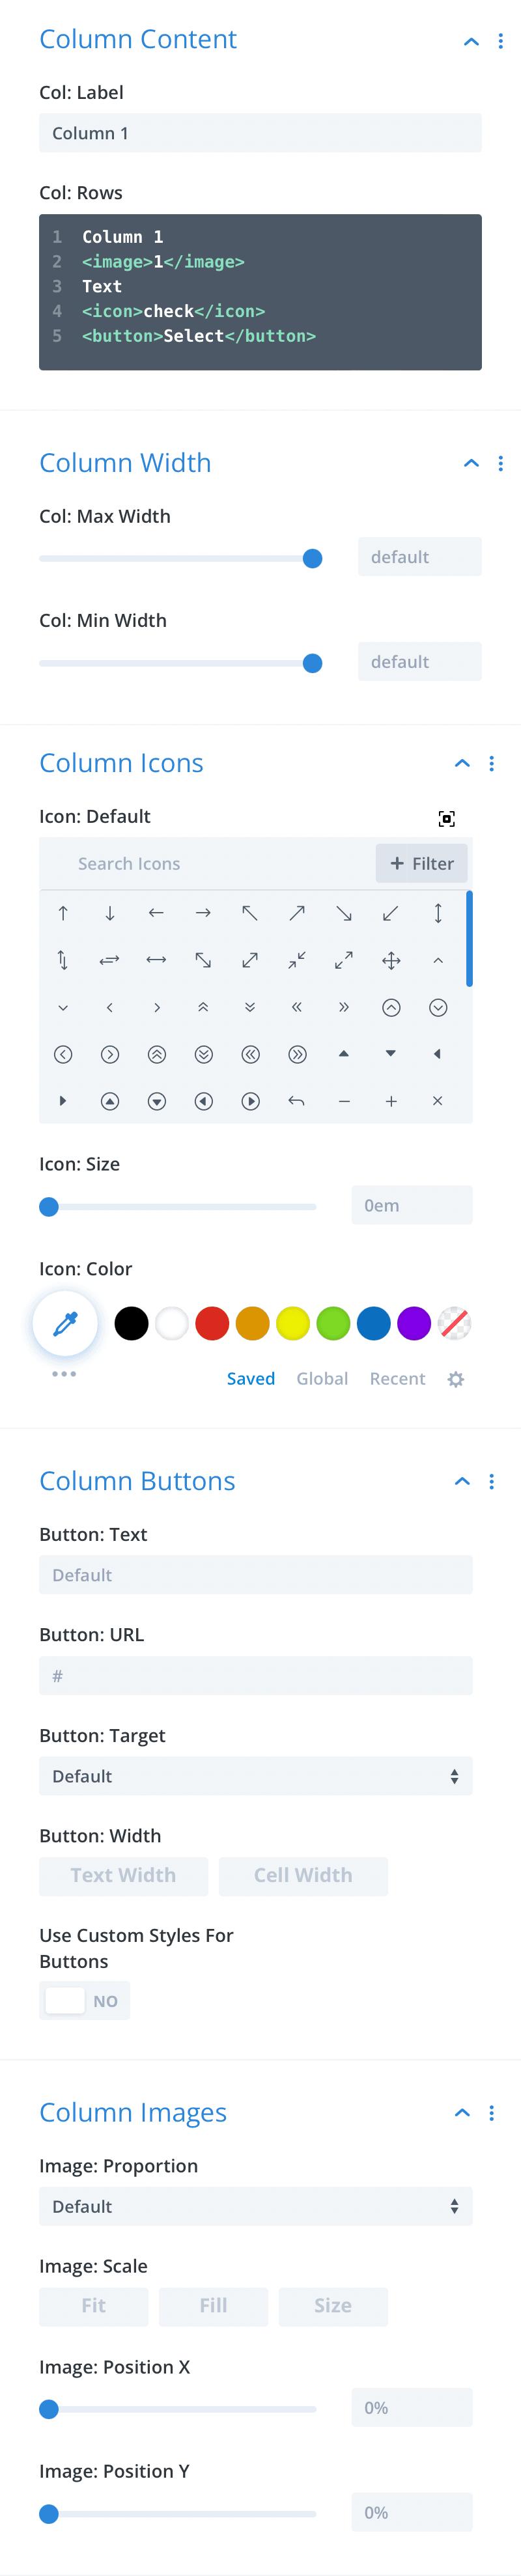 Divi-Modules – Table Maker column content settings